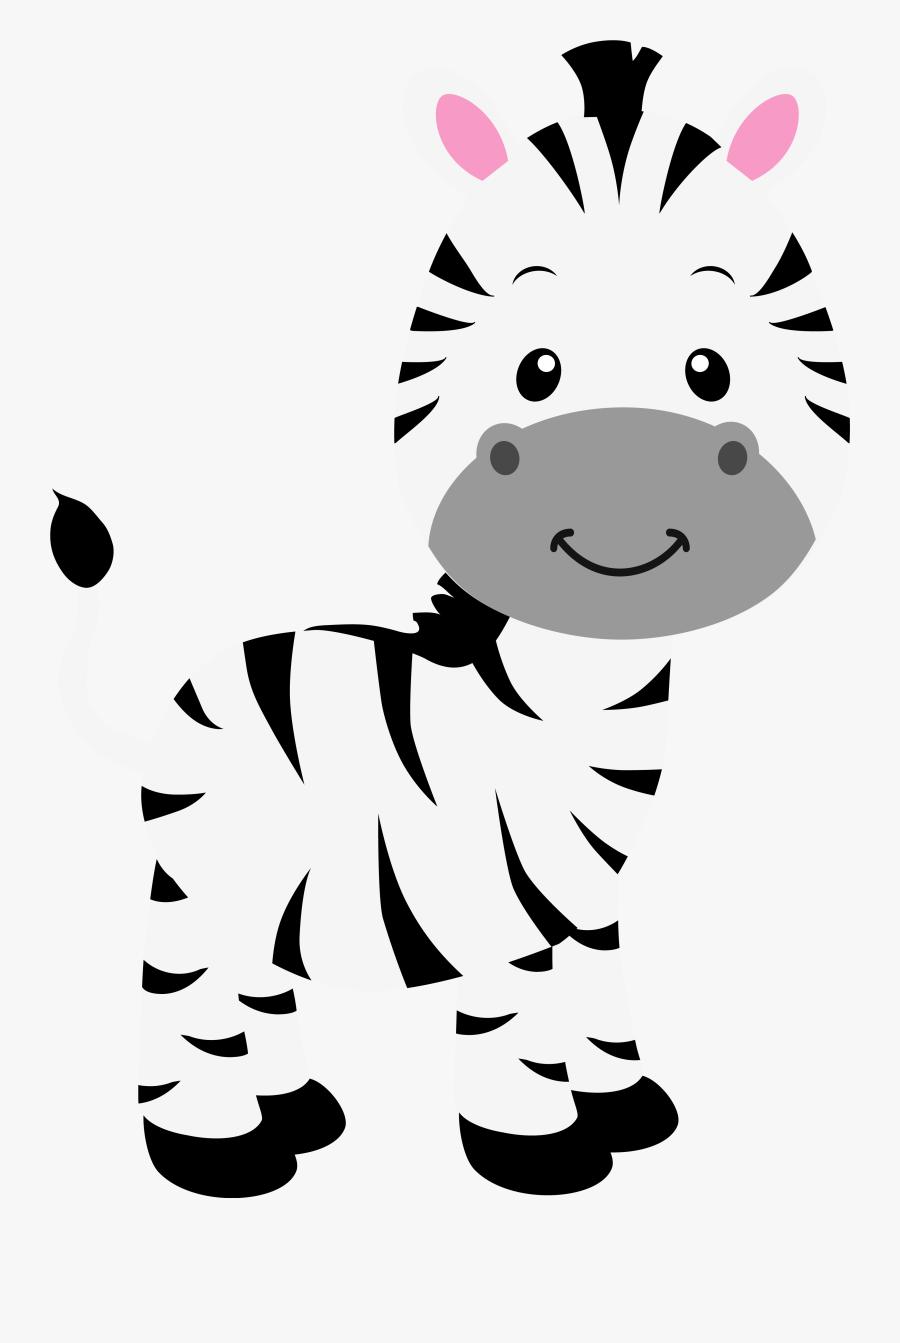 Clip Art Fiesta Clip Art Black And White - Cebra En Foami Moldes, Transparent Clipart